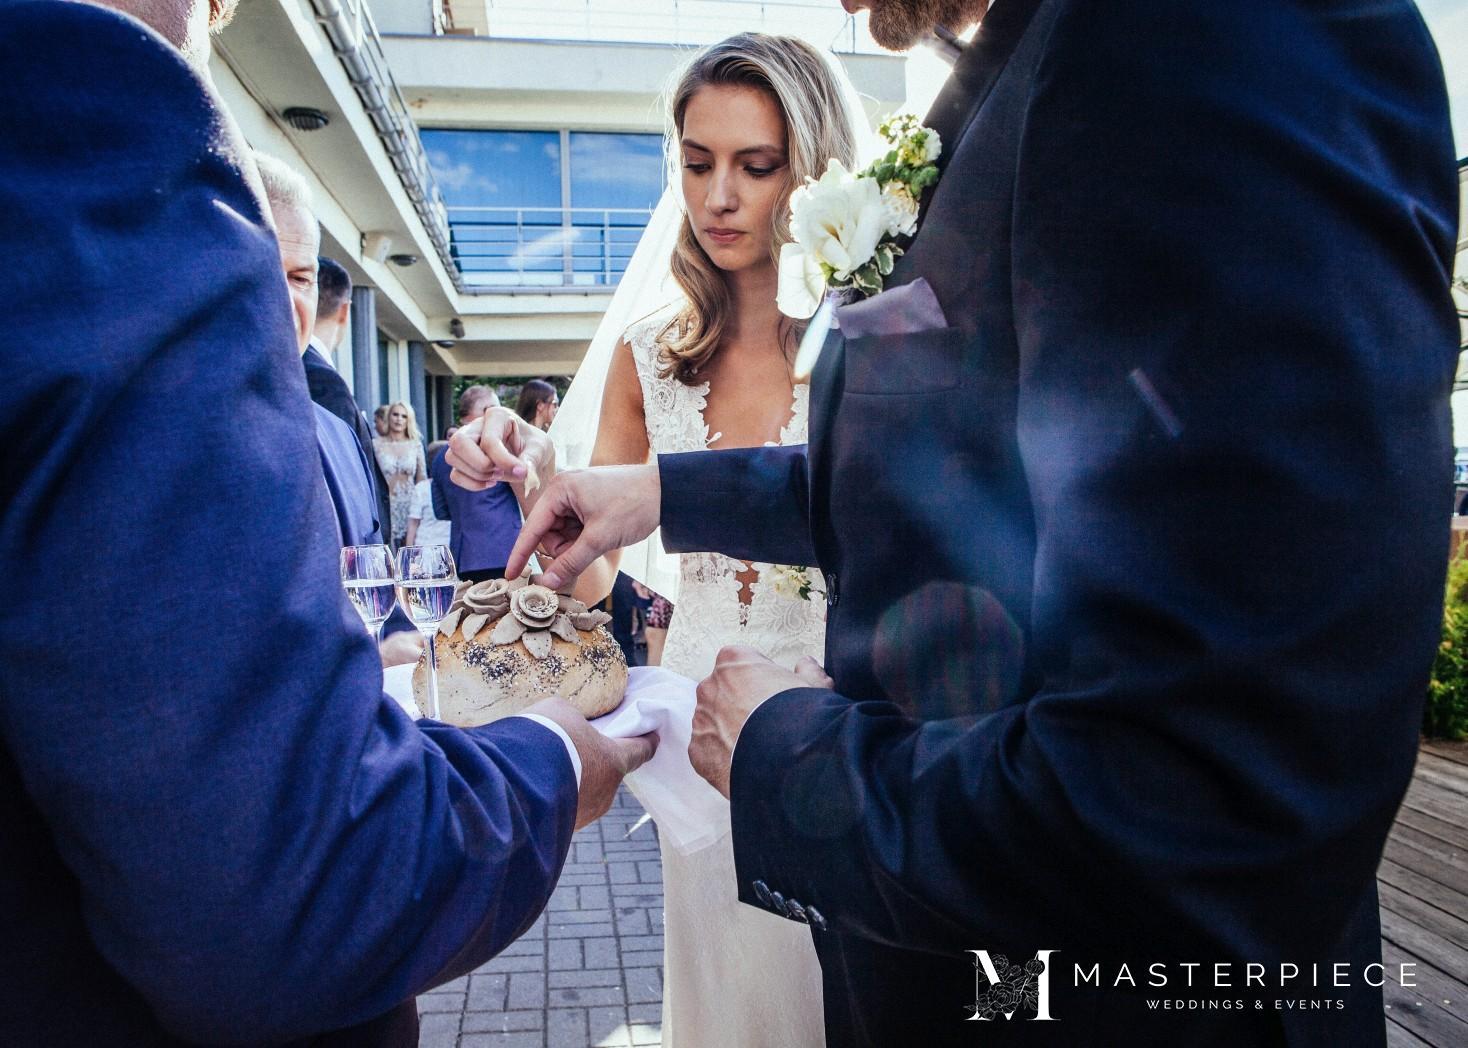 Masterpiece_Weddings_sluby_070